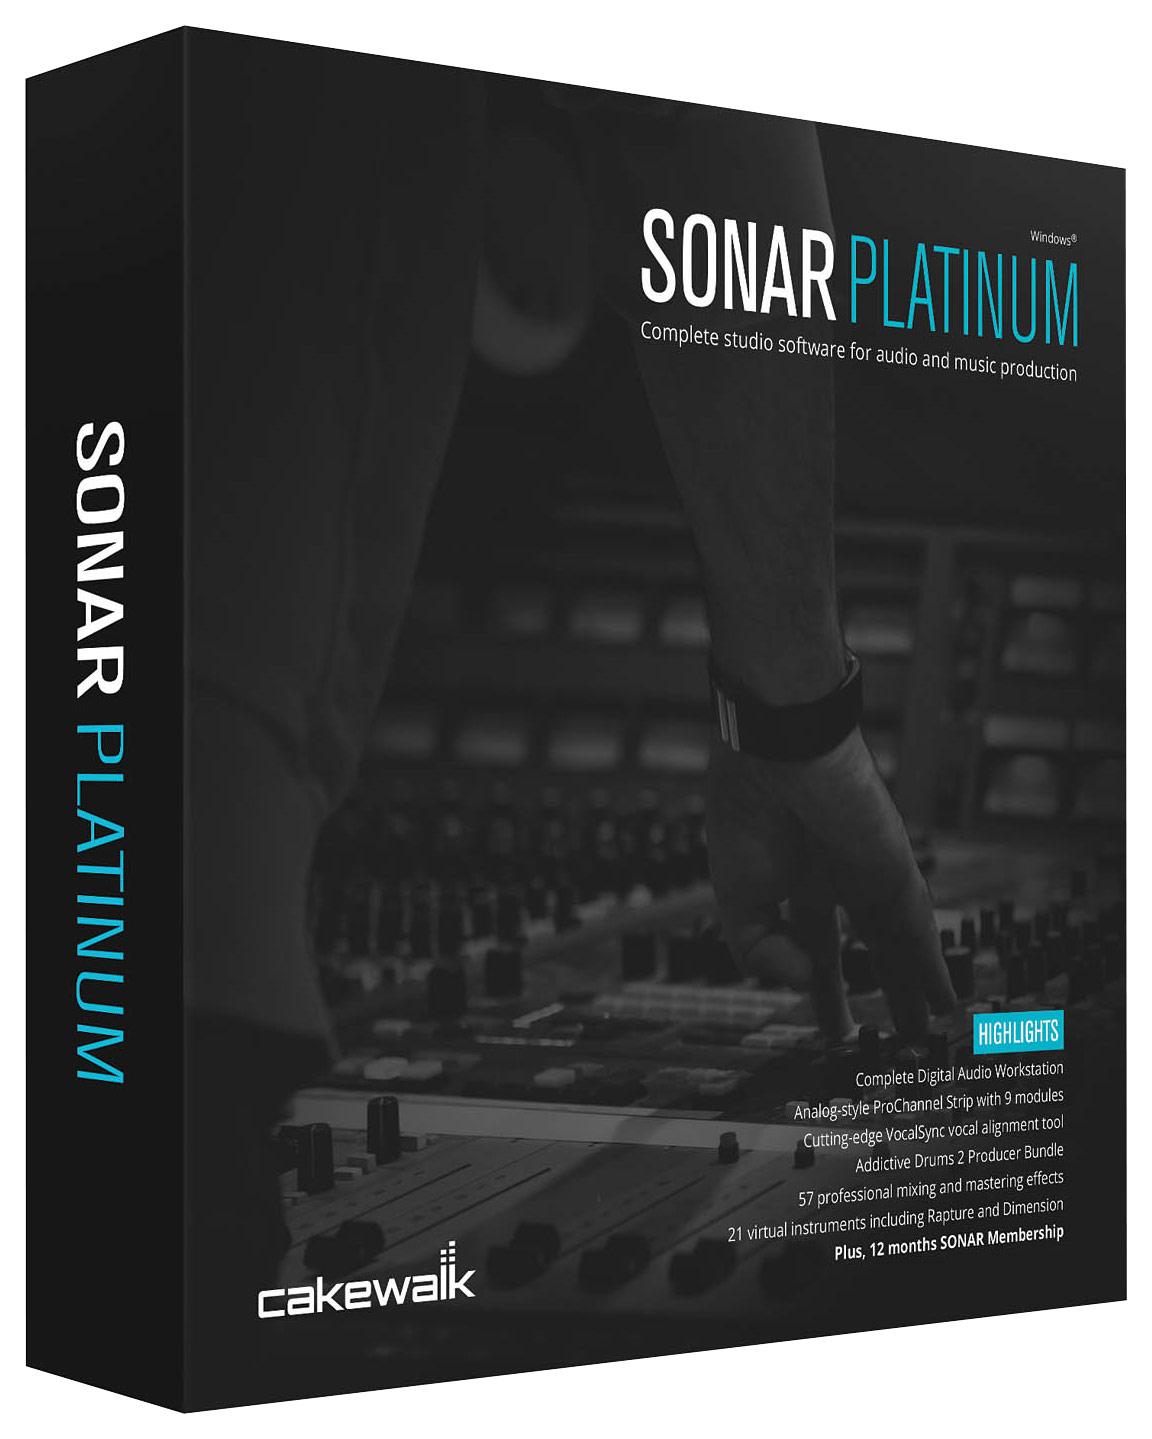 SONAR Platinum Software for PC - Windows